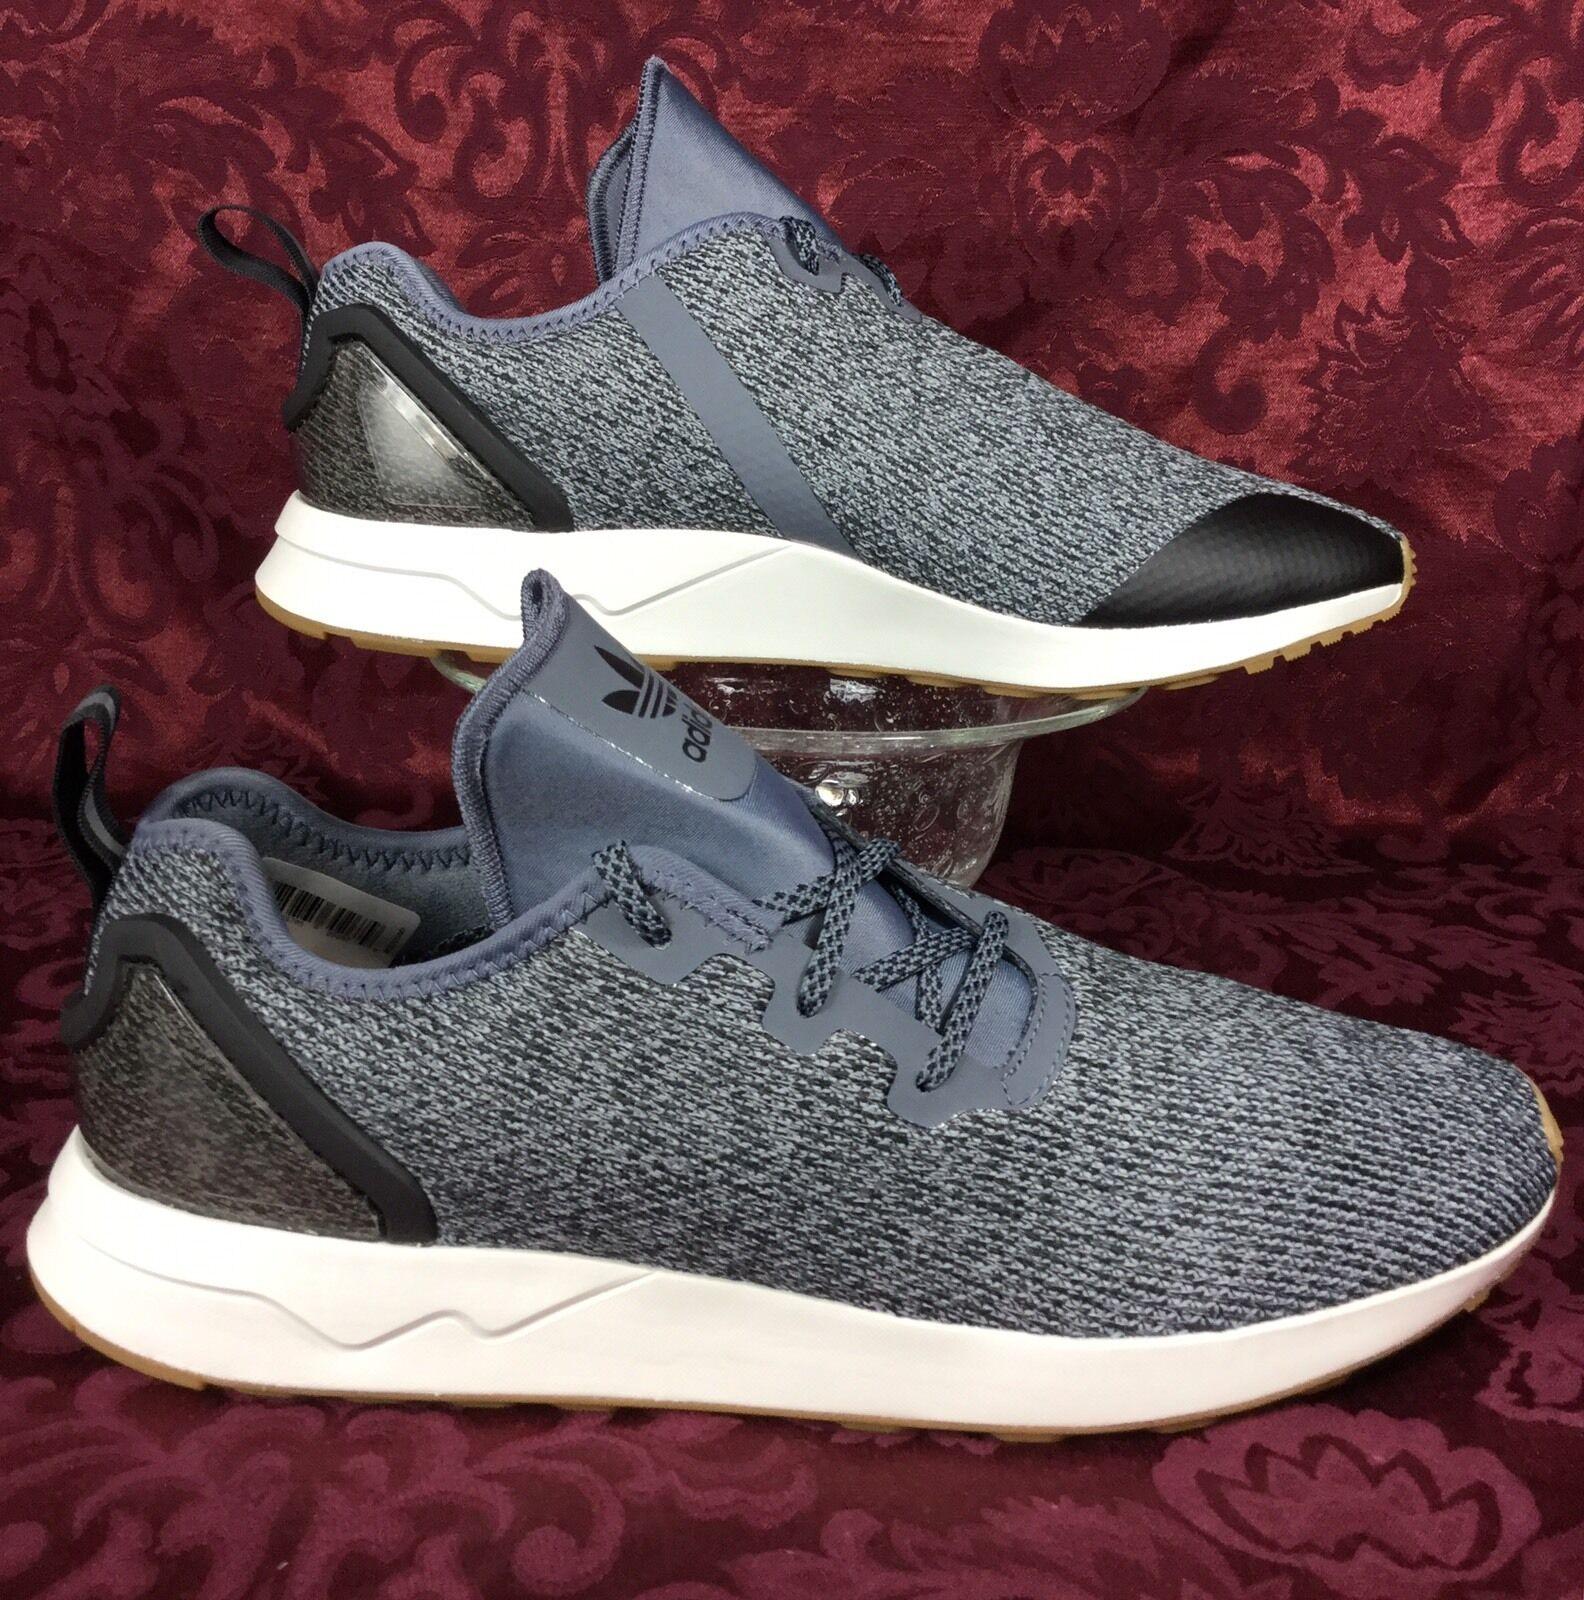 Adidas ZX FLUX ADV ASYMMETRICAL ASYM BB3705 ONIX Core Black Gum PK xeno boost 10